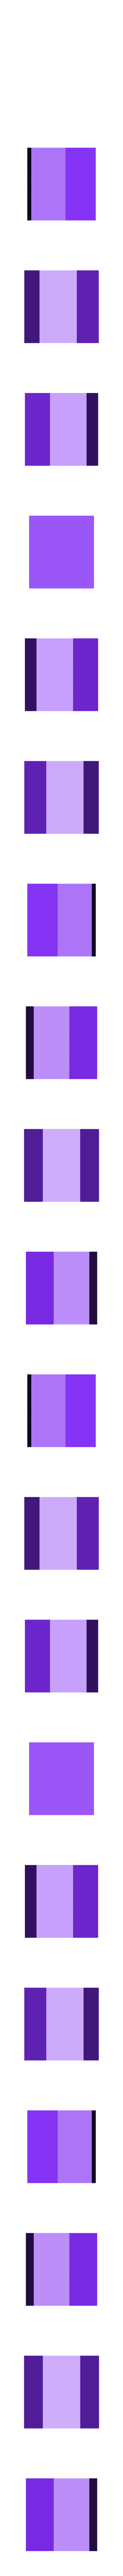 Hex_Module_LARGE.stl Download free STL file Modular Hex Drawers • Design to 3D print, O3D